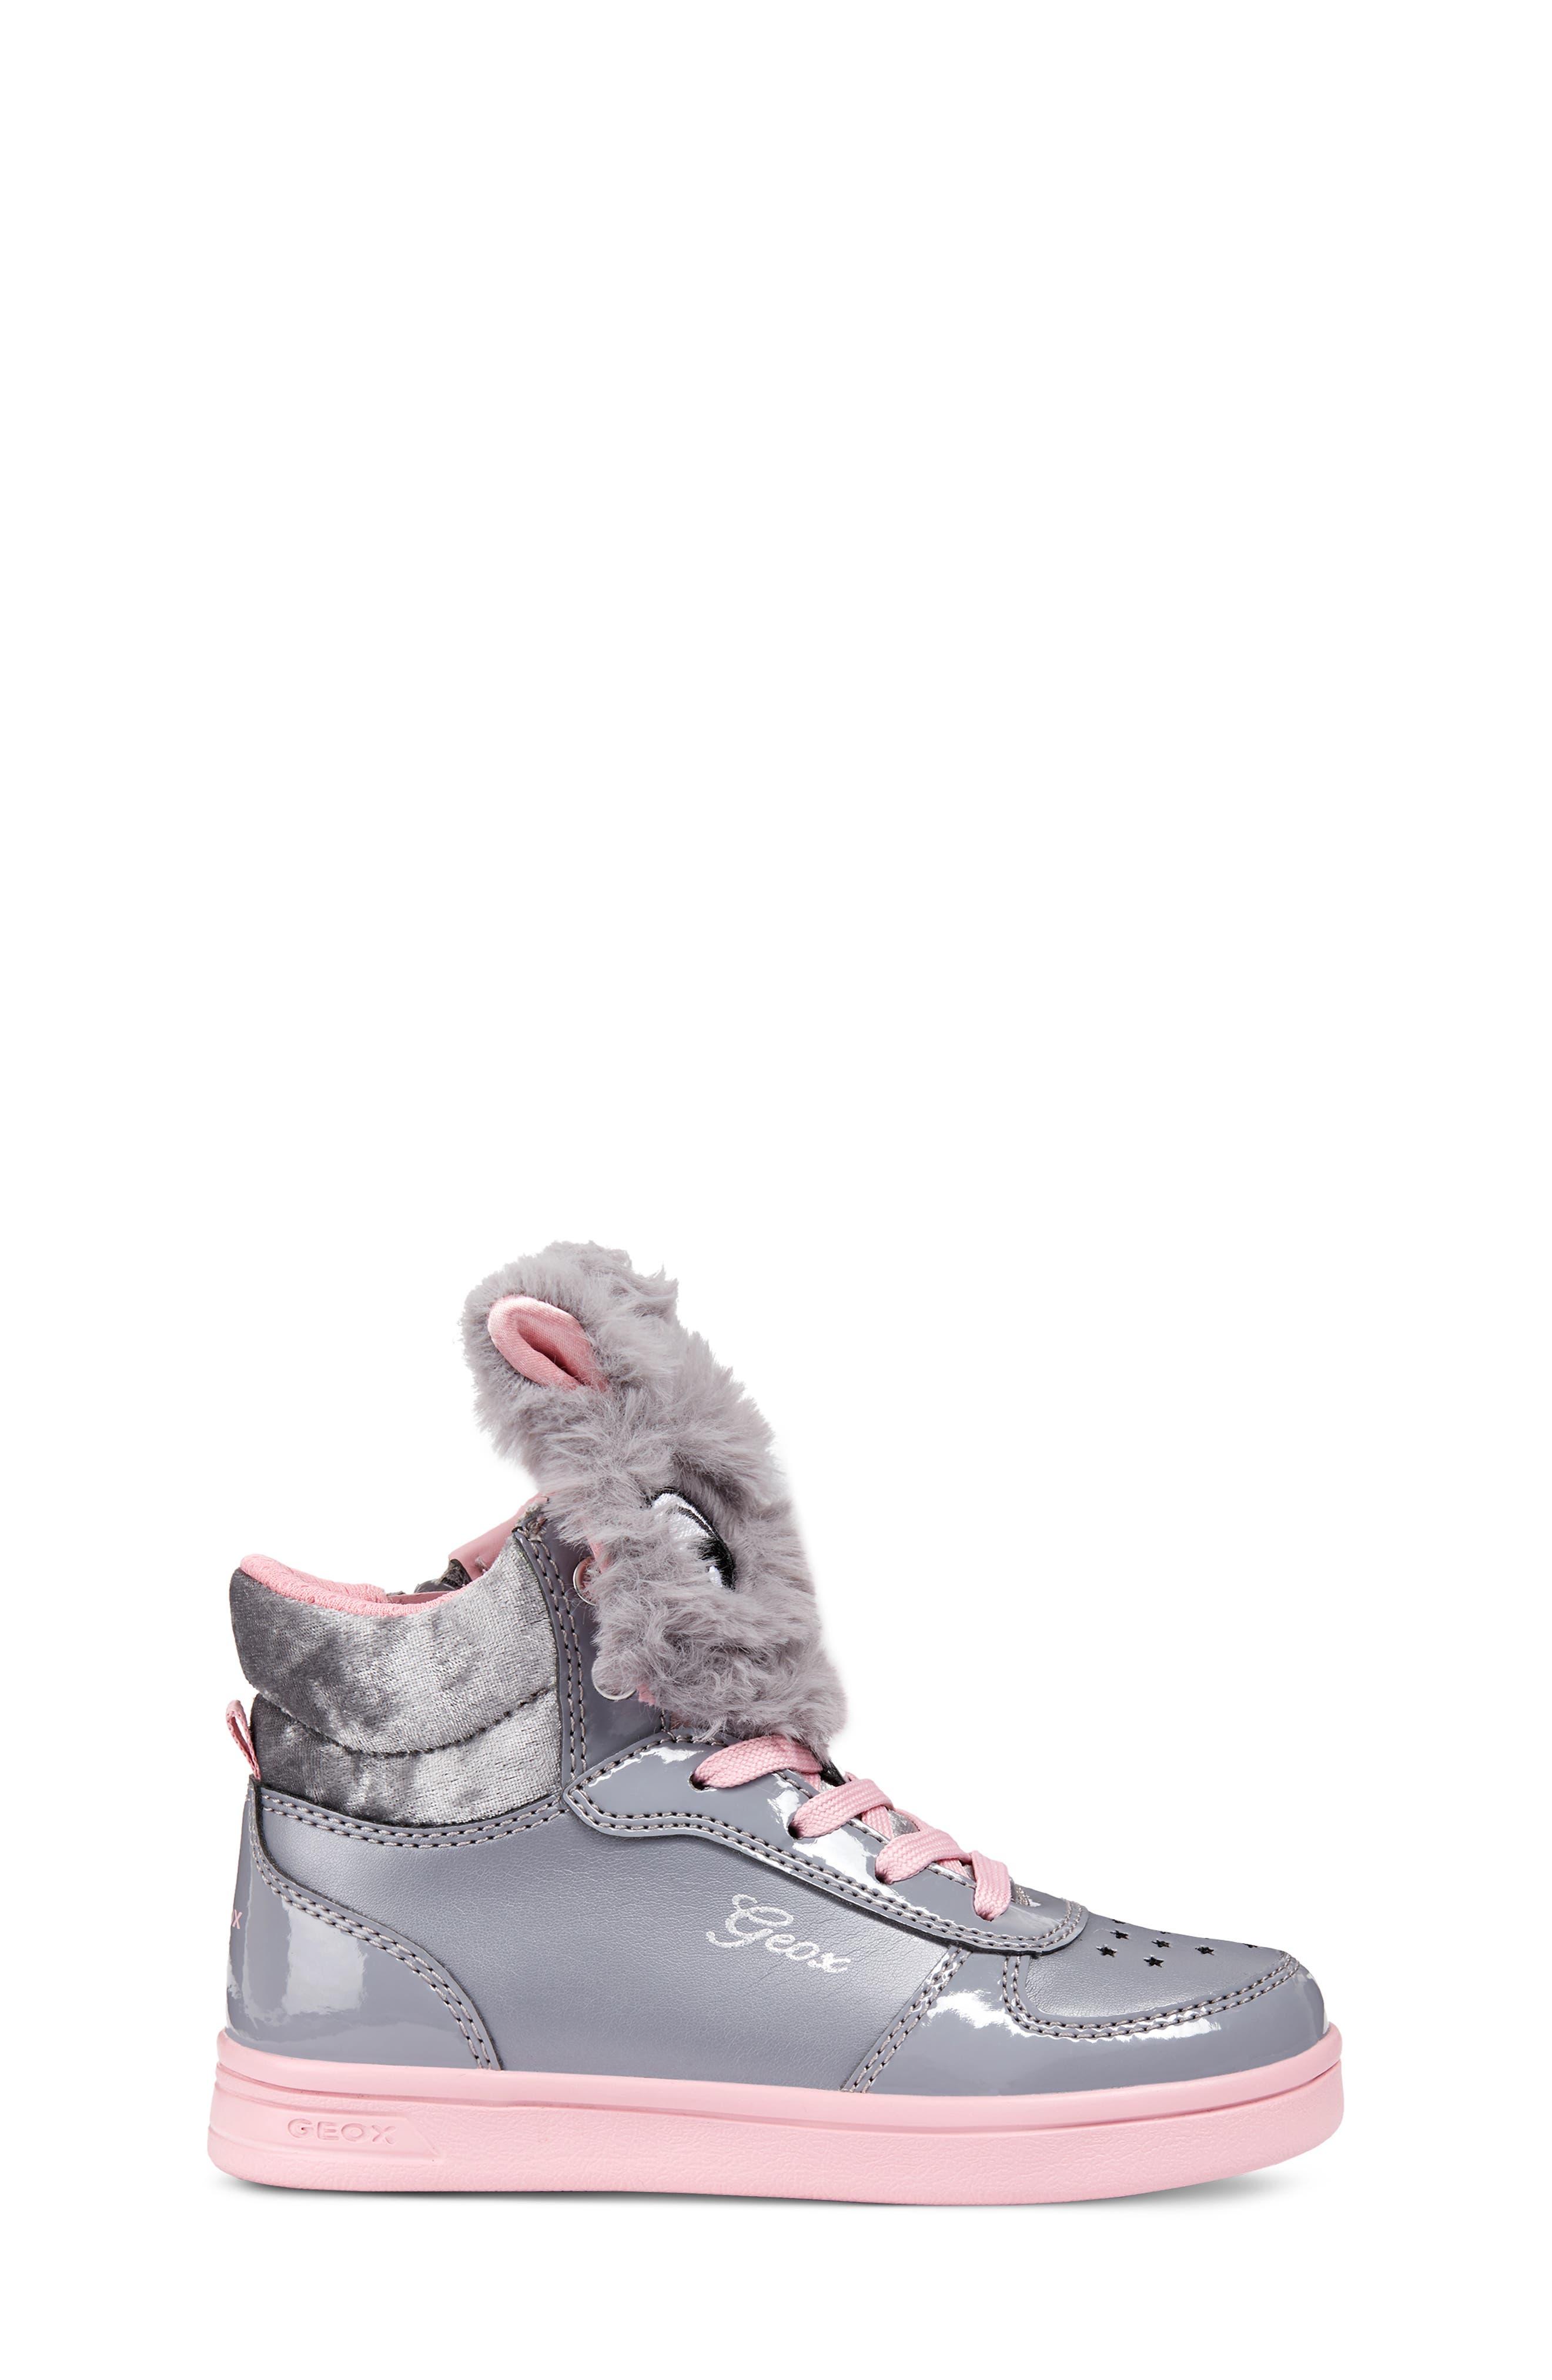 DJ Rock Fuzzy Friend Sneaker,                             Alternate thumbnail 3, color,                             GREY/PINK